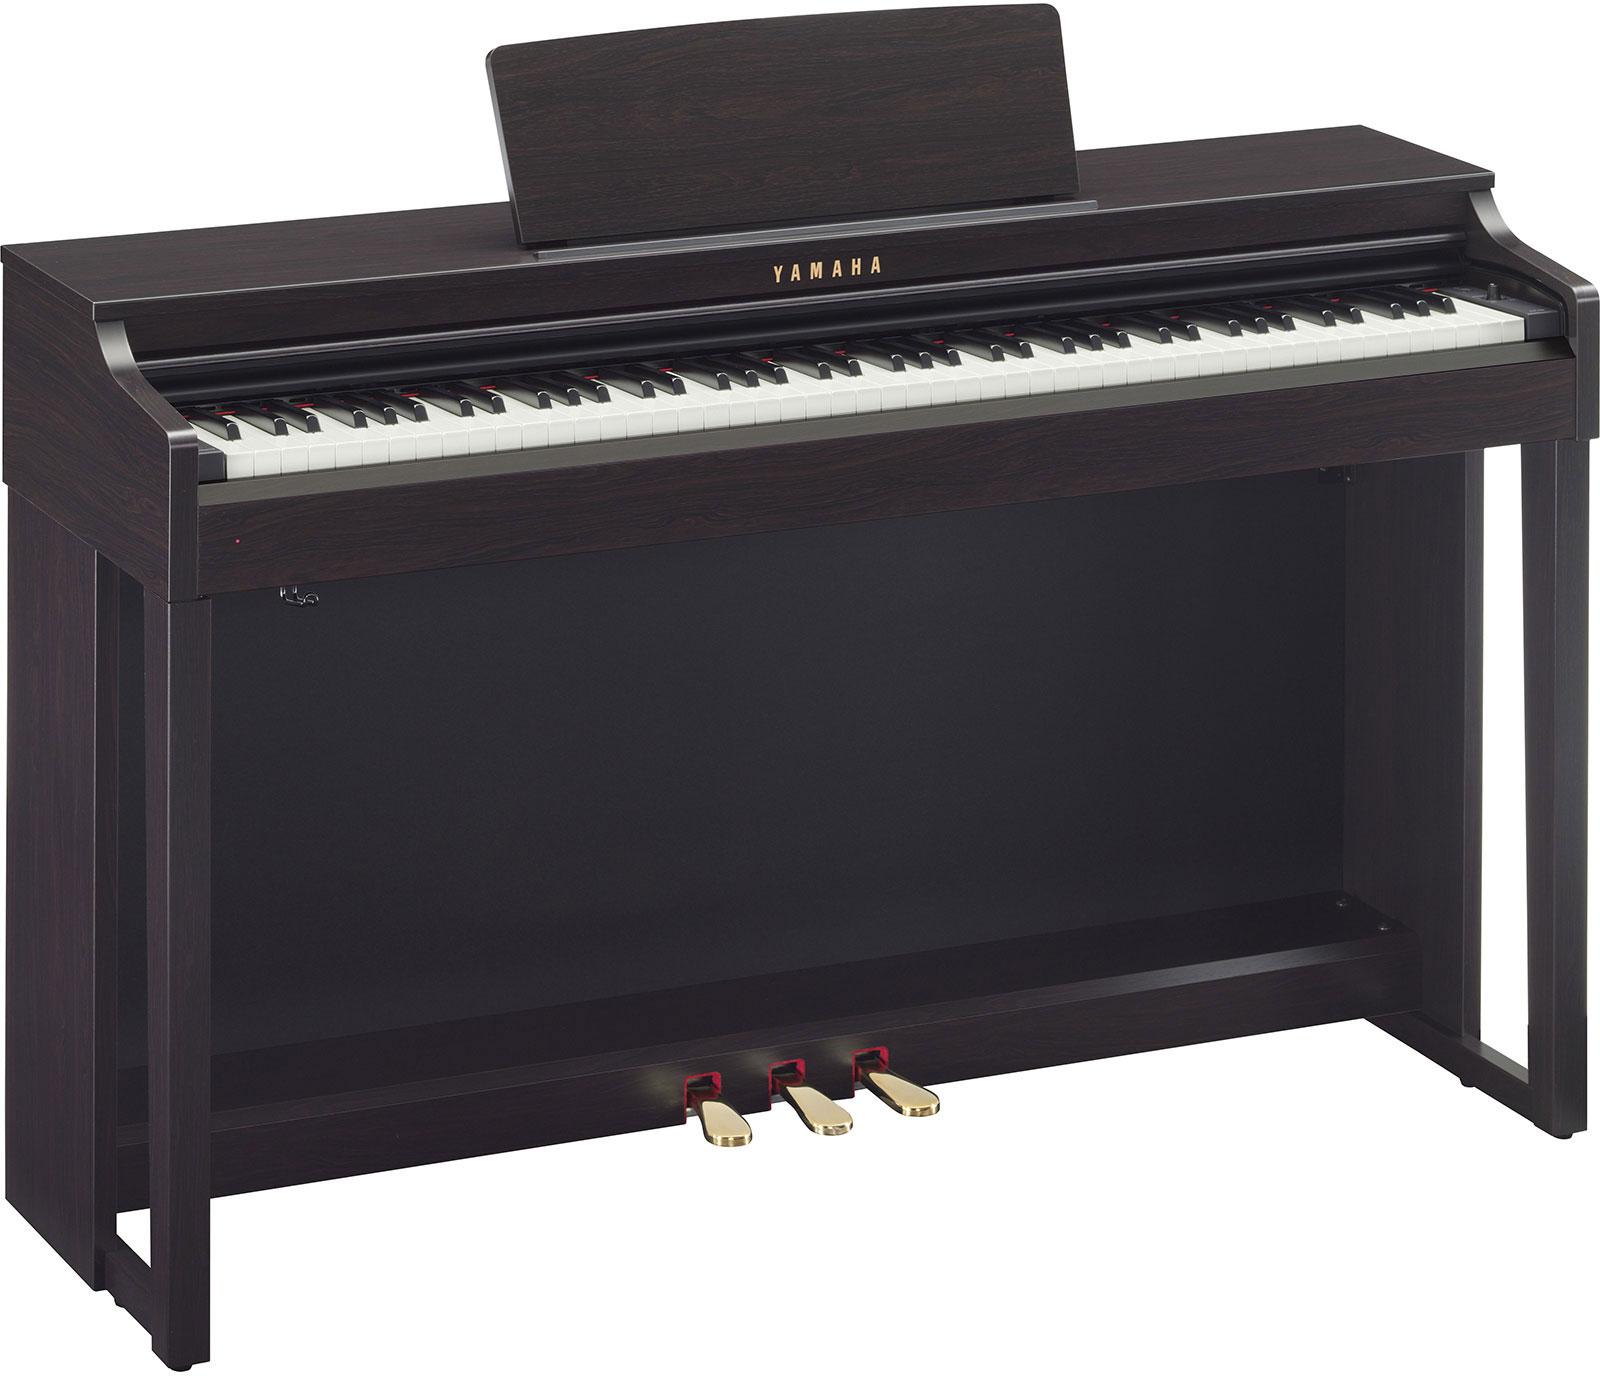 Yamaha CLP-525R Rosewood digitalni klavir